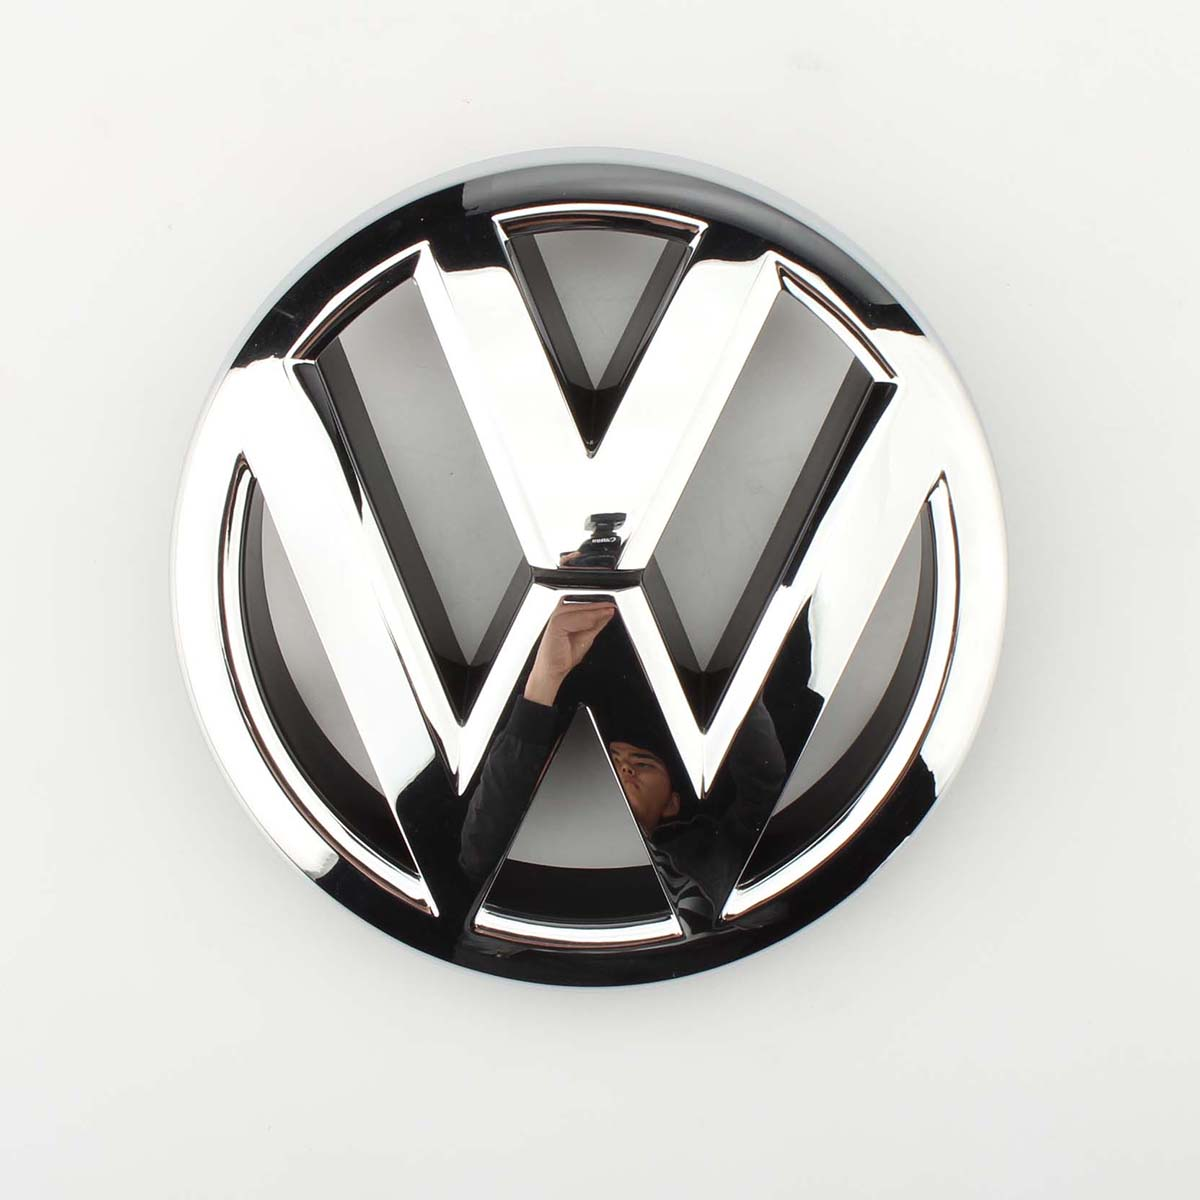 Car Auto VW Emblem Chrome OEM Front Grille Badge Sticker For Volkswagen Jetta MK6 Sedan 2011-2015 5C6853601ULM new auto car super bee for charger srt8 front grill grille emblem badge 02